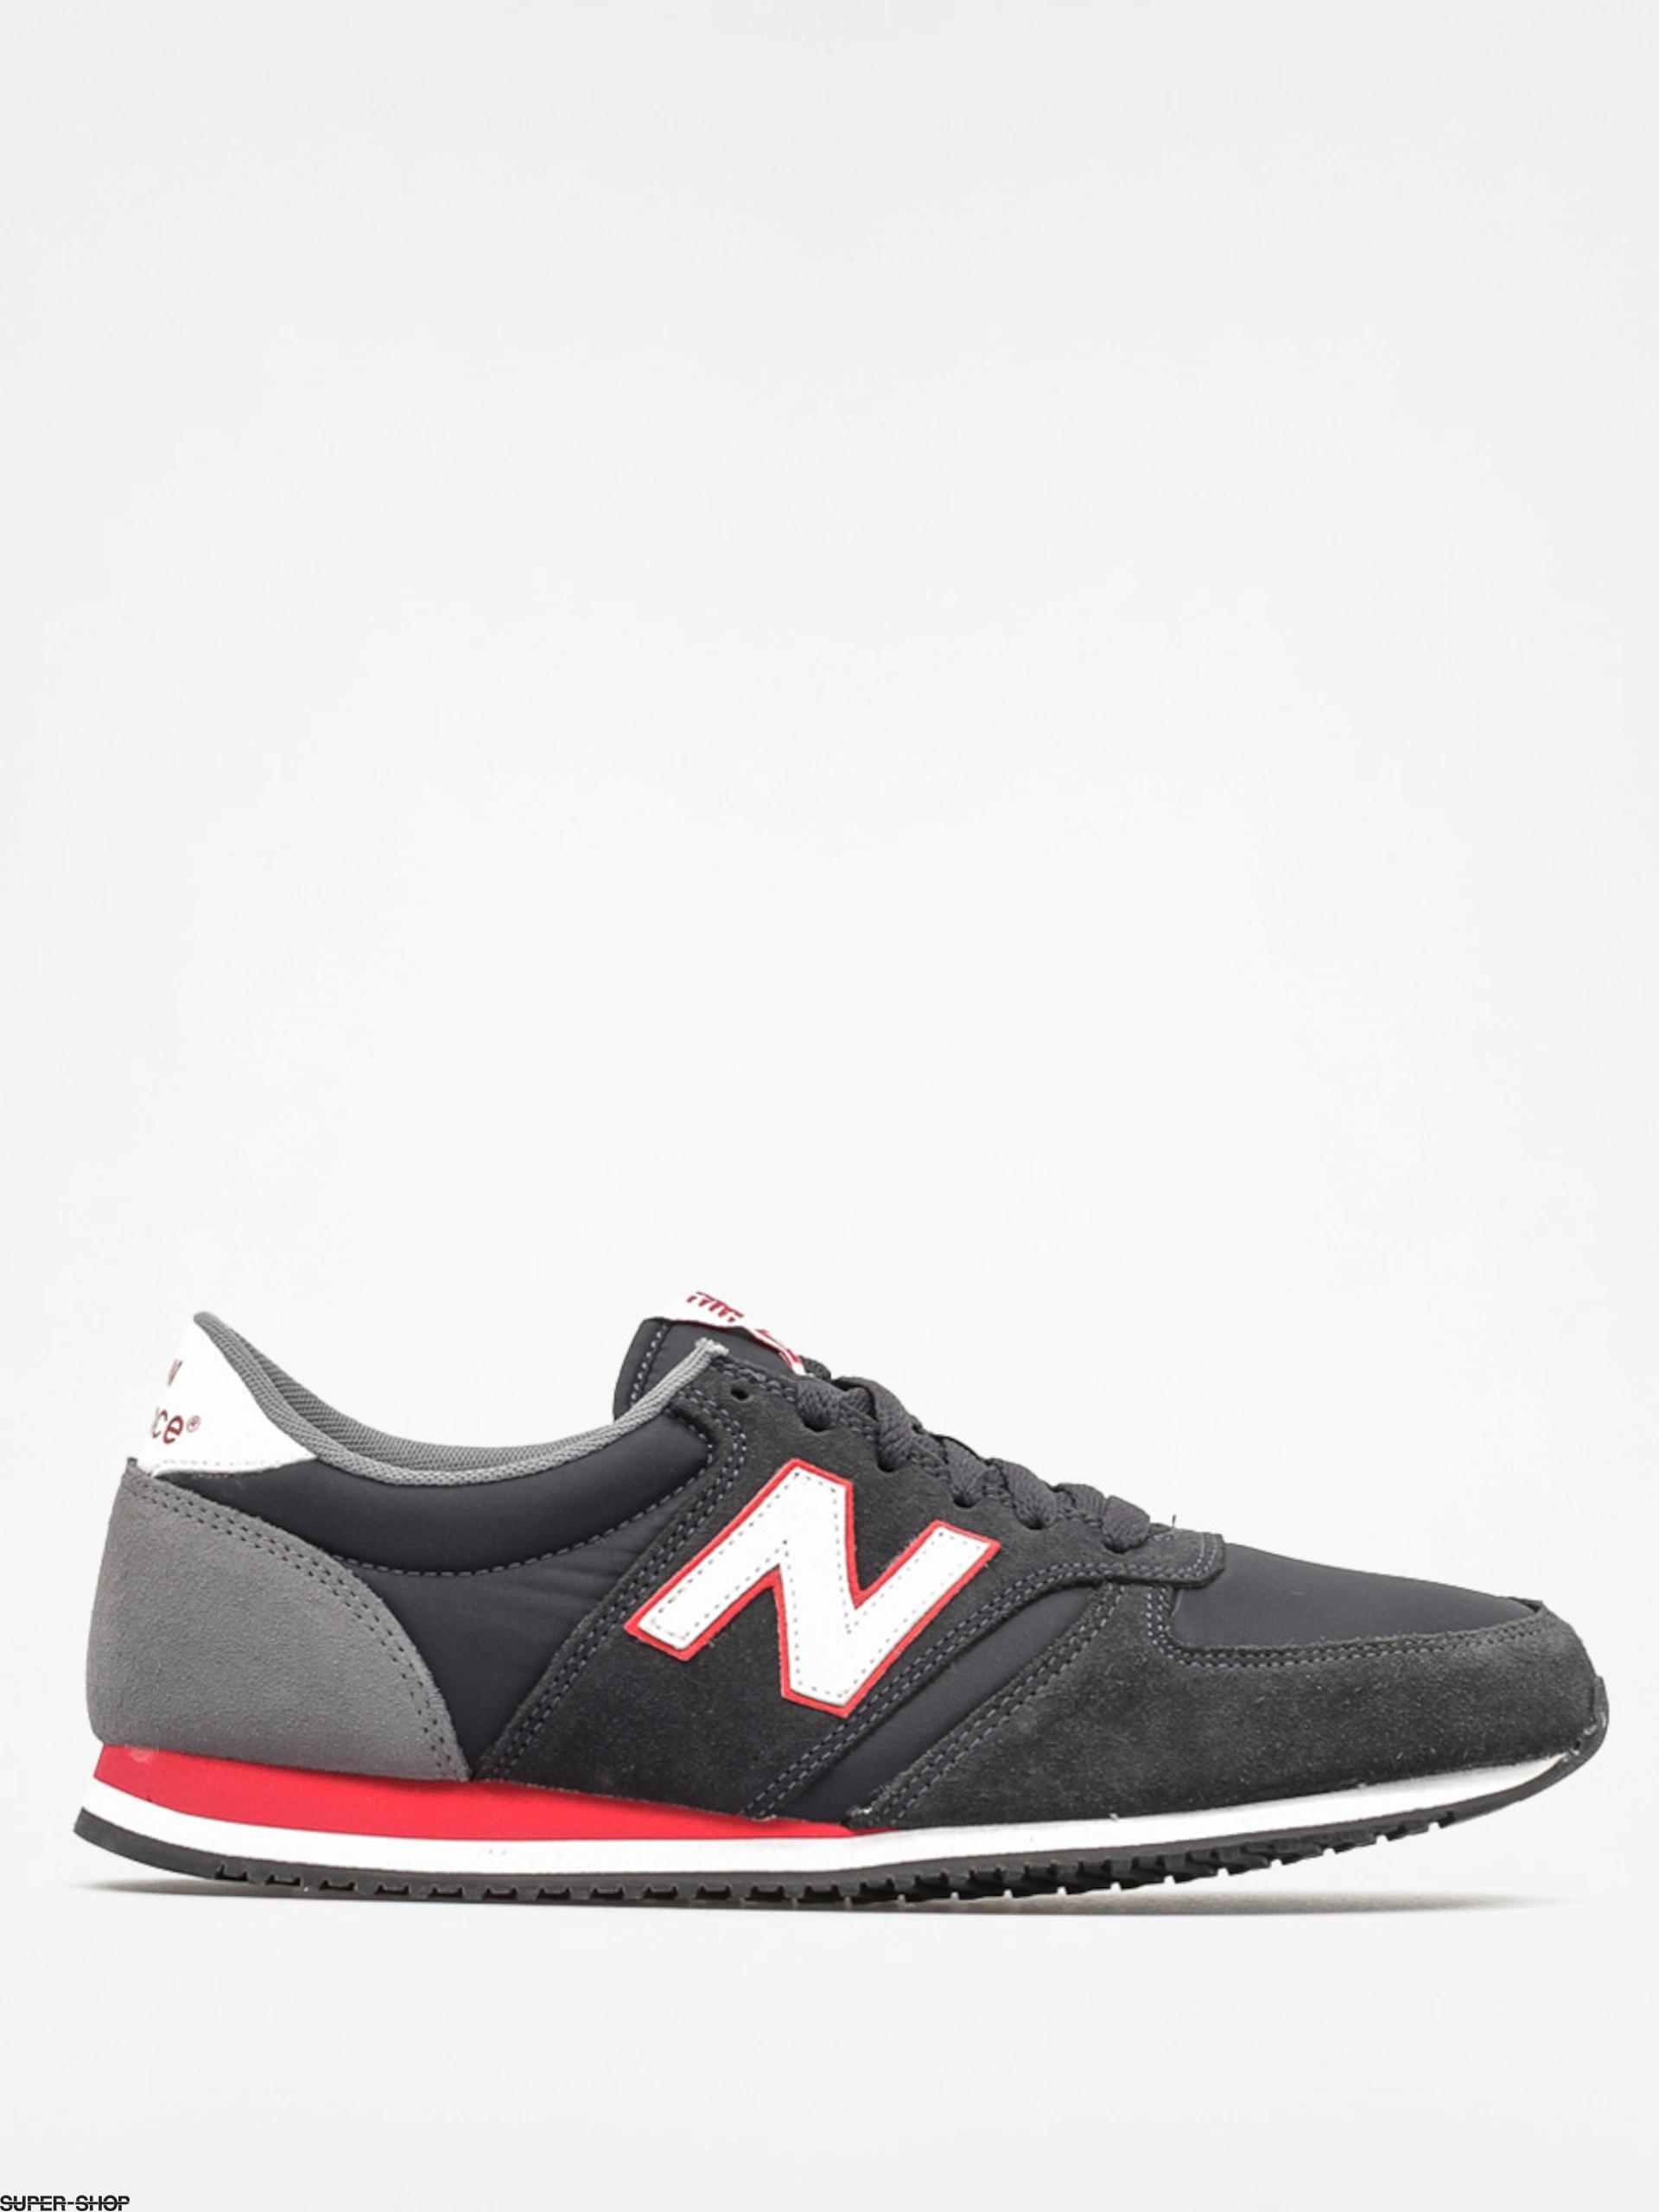 new styles eddee 47f01 New Balance Shoes 420 (nnr)